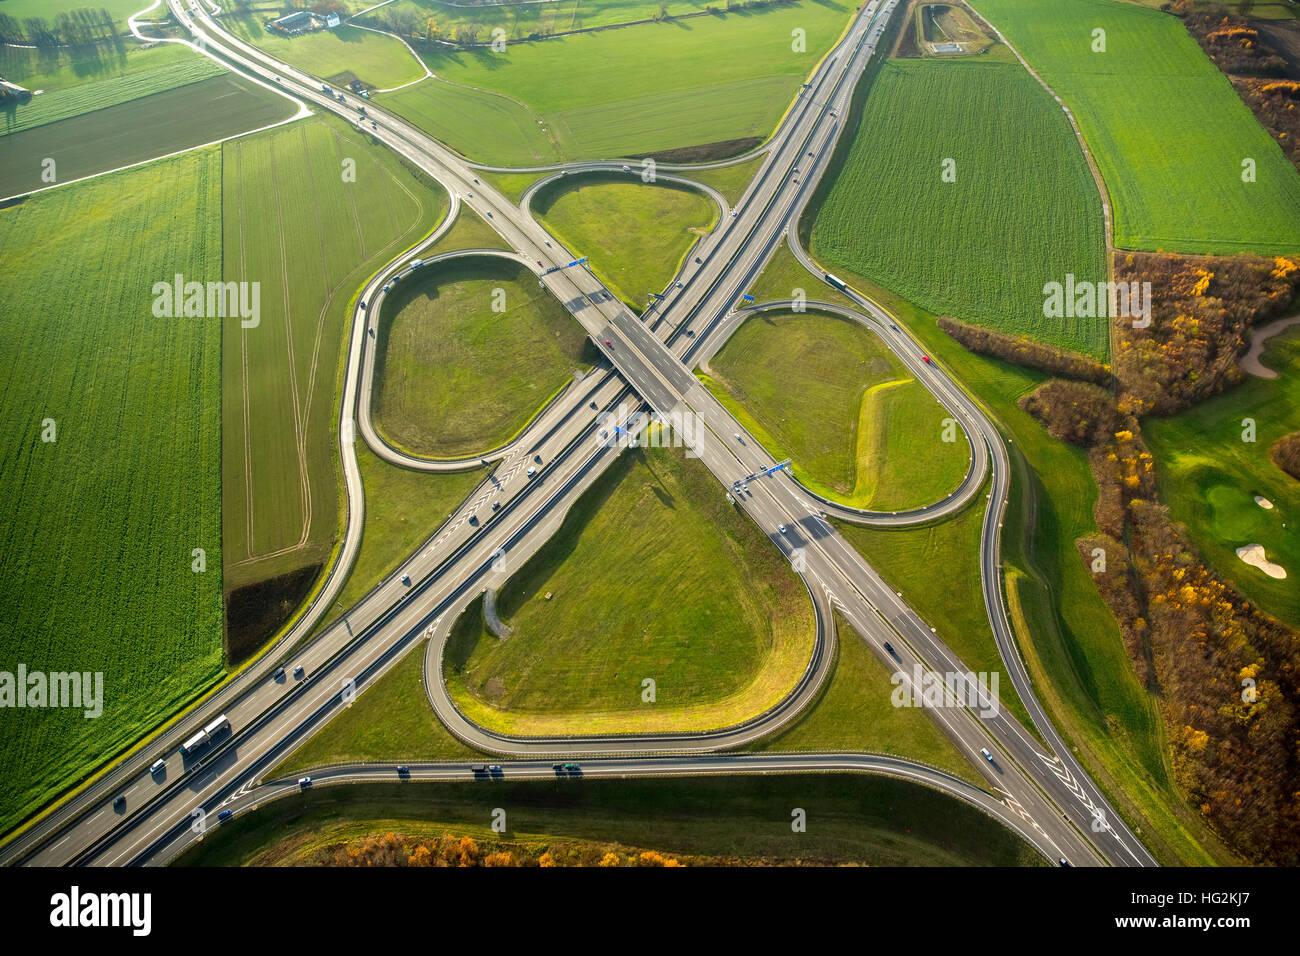 Aerial view, interchange interchange Duisburg-South, Highway 59 and federal highway B288, Duisburg, Dusseldorf, - Stock Image